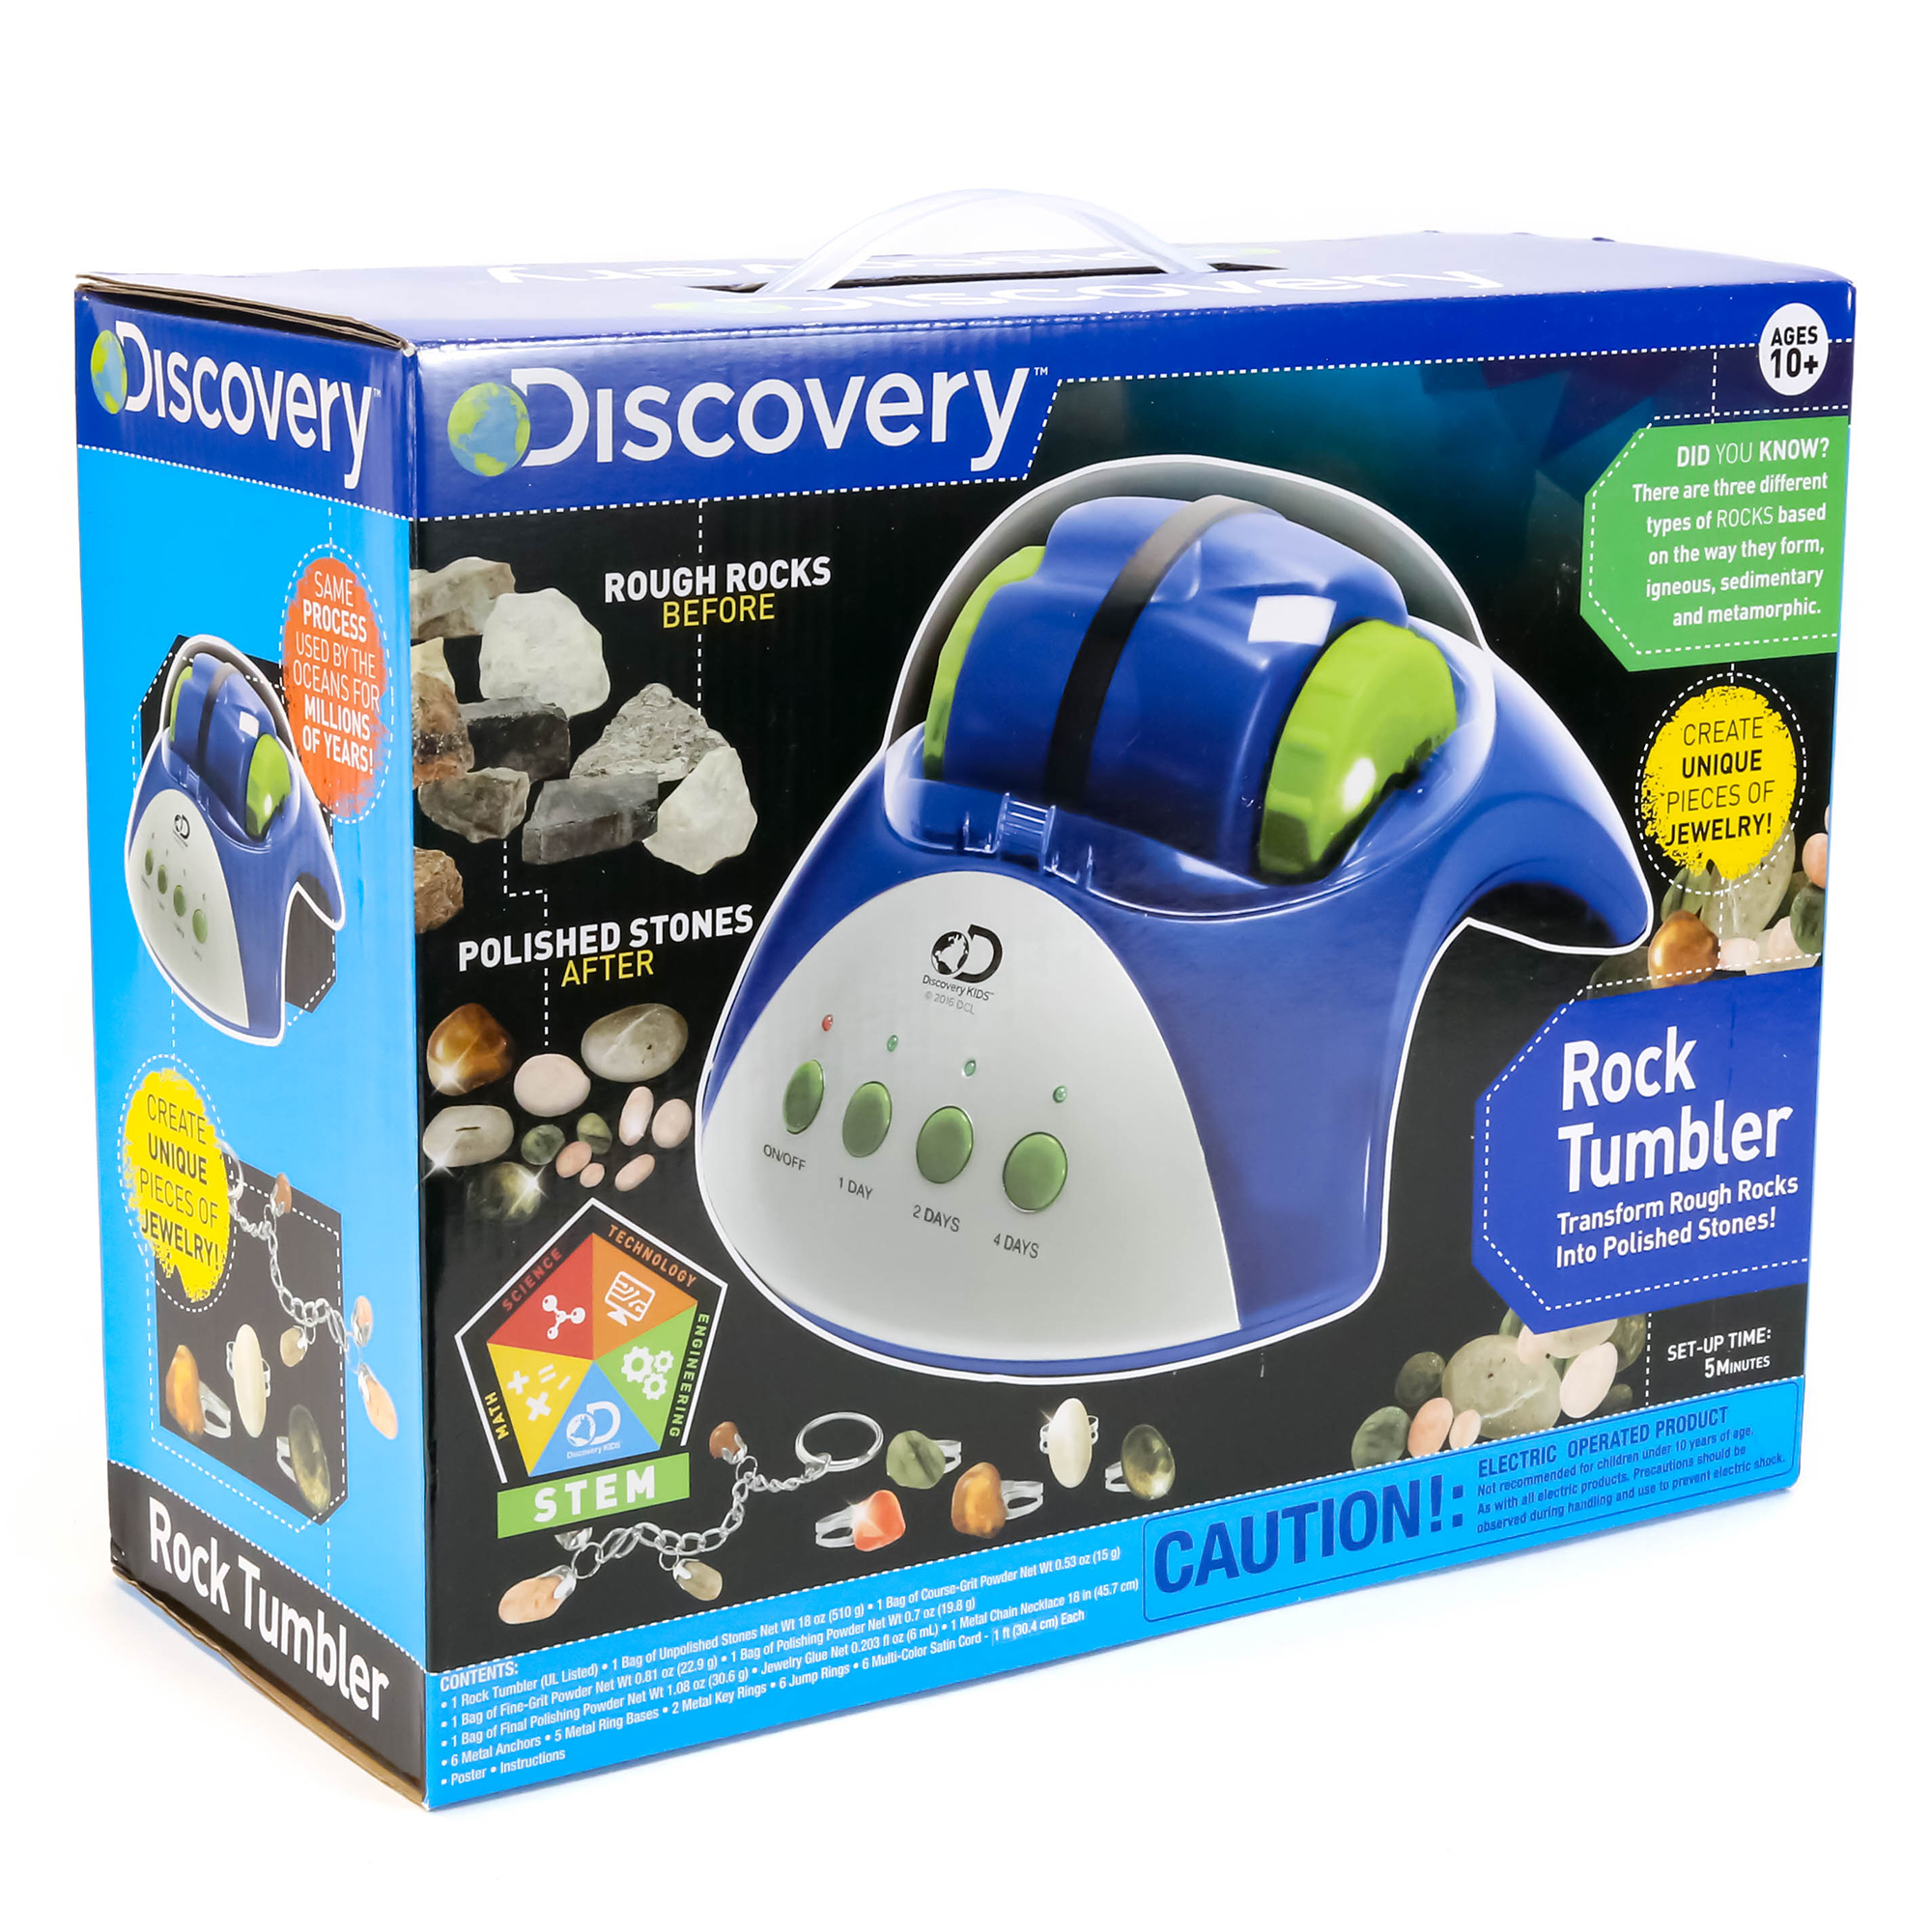 Discovery Rock Tumbler Walmart